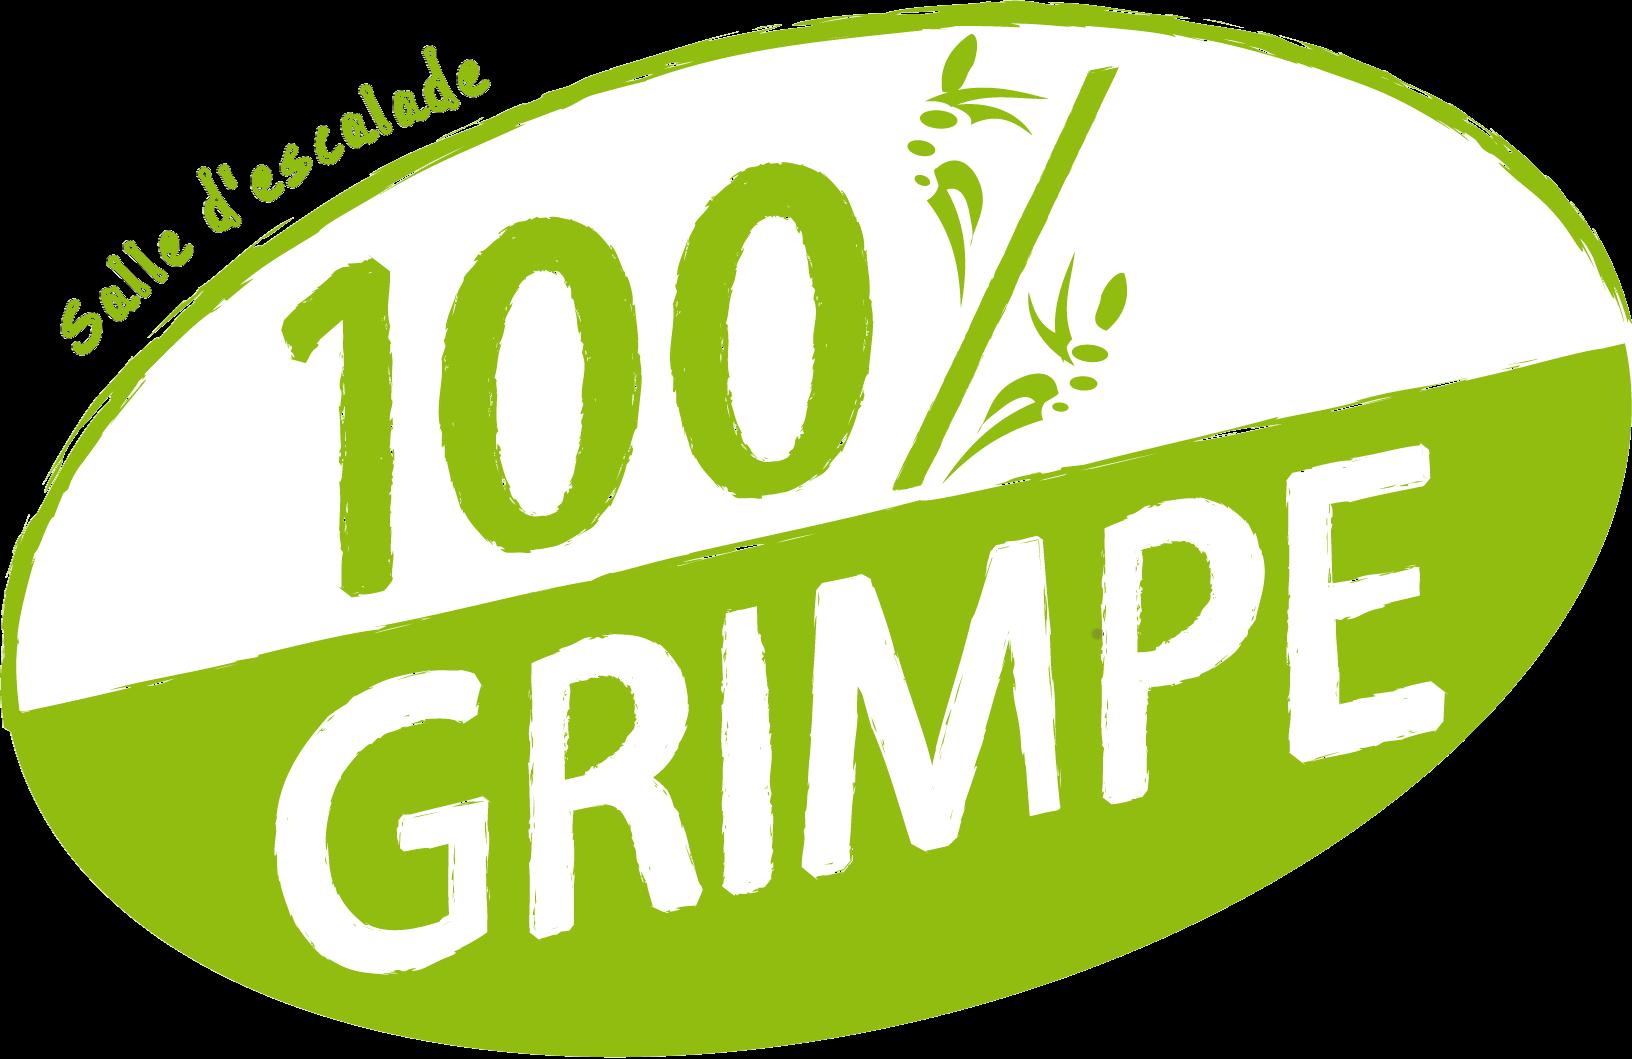 100% GRIMPE